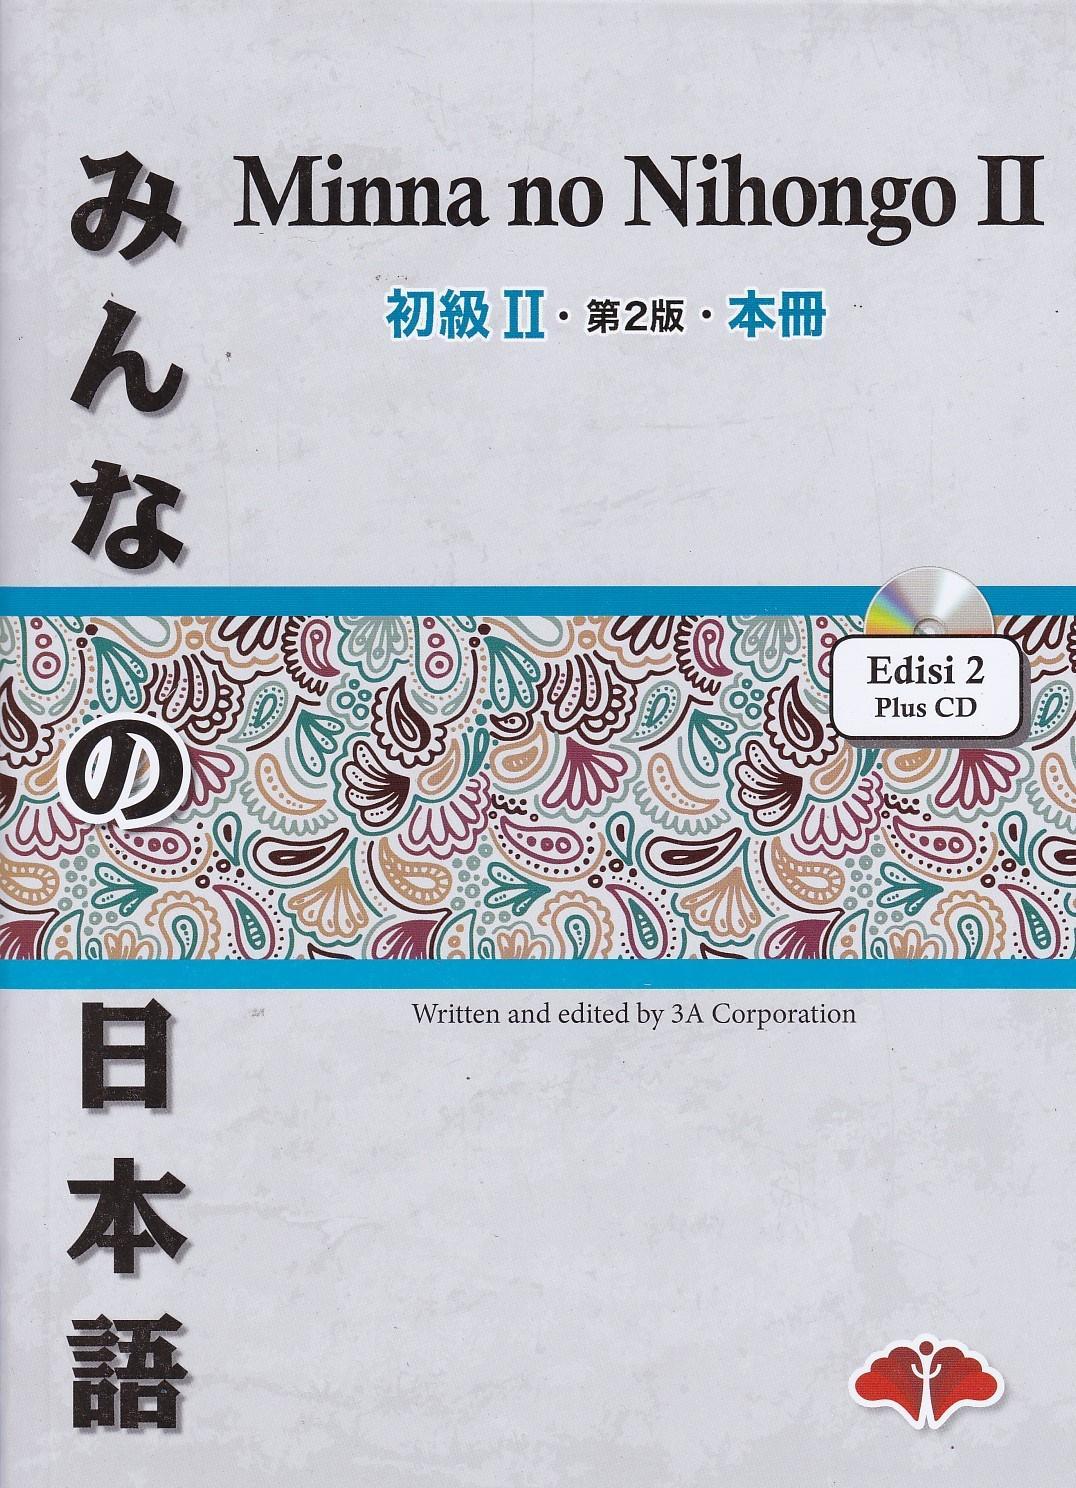 Uranus Pustaka Lintas B - Minna No Nihongo 2 ed 2 + CD